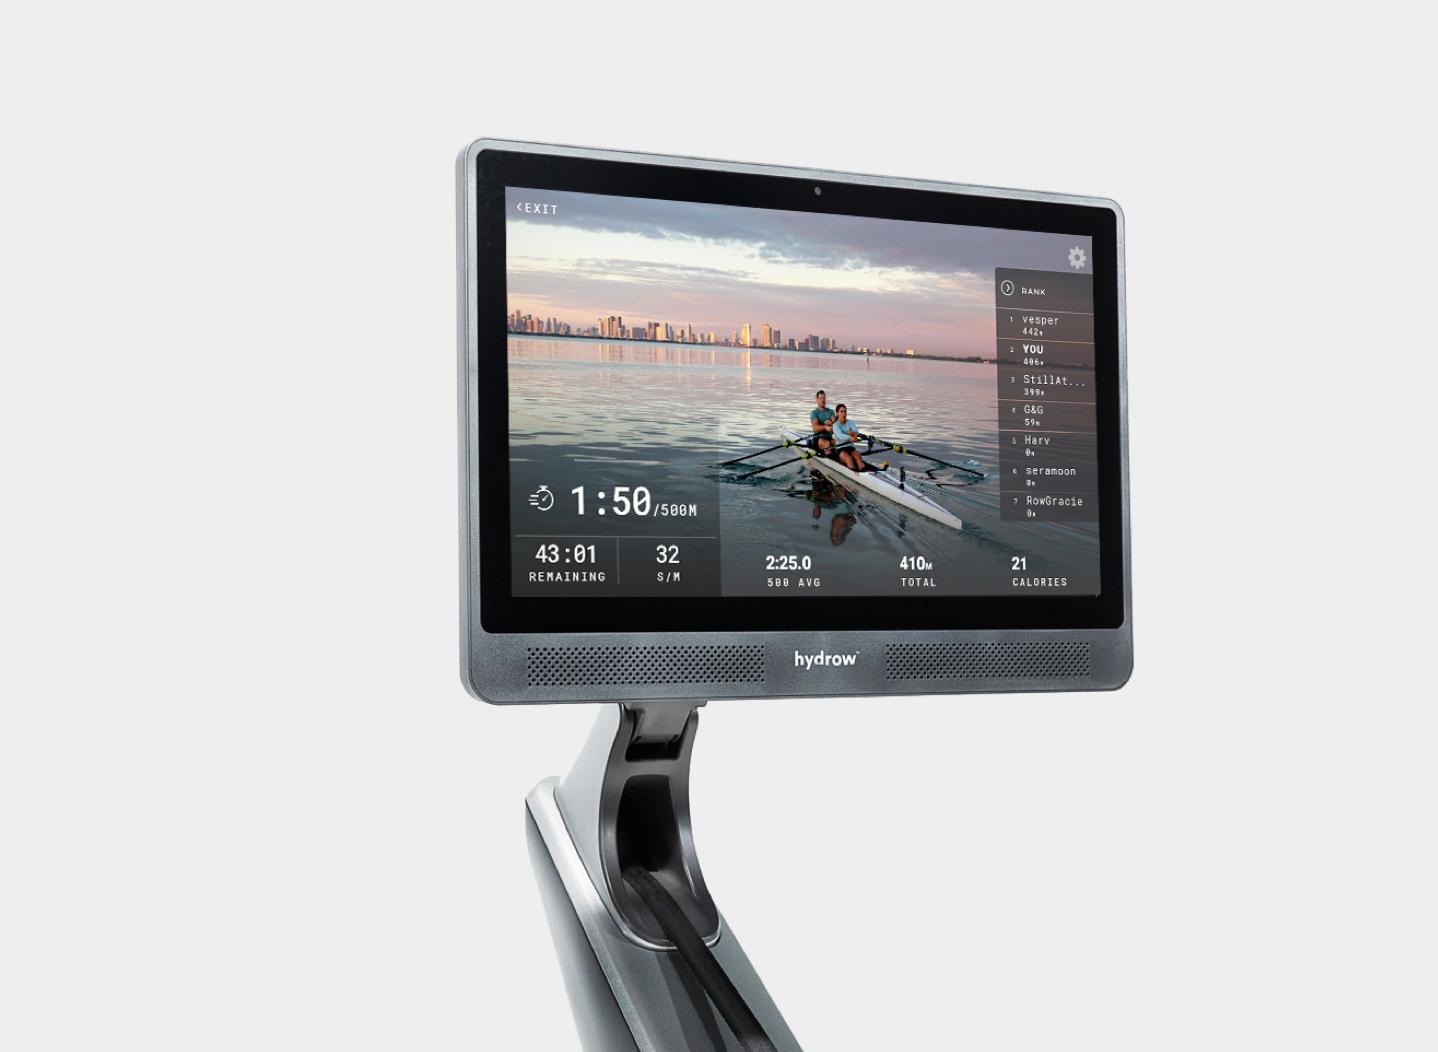 Hydrow Rowing Machine Screen